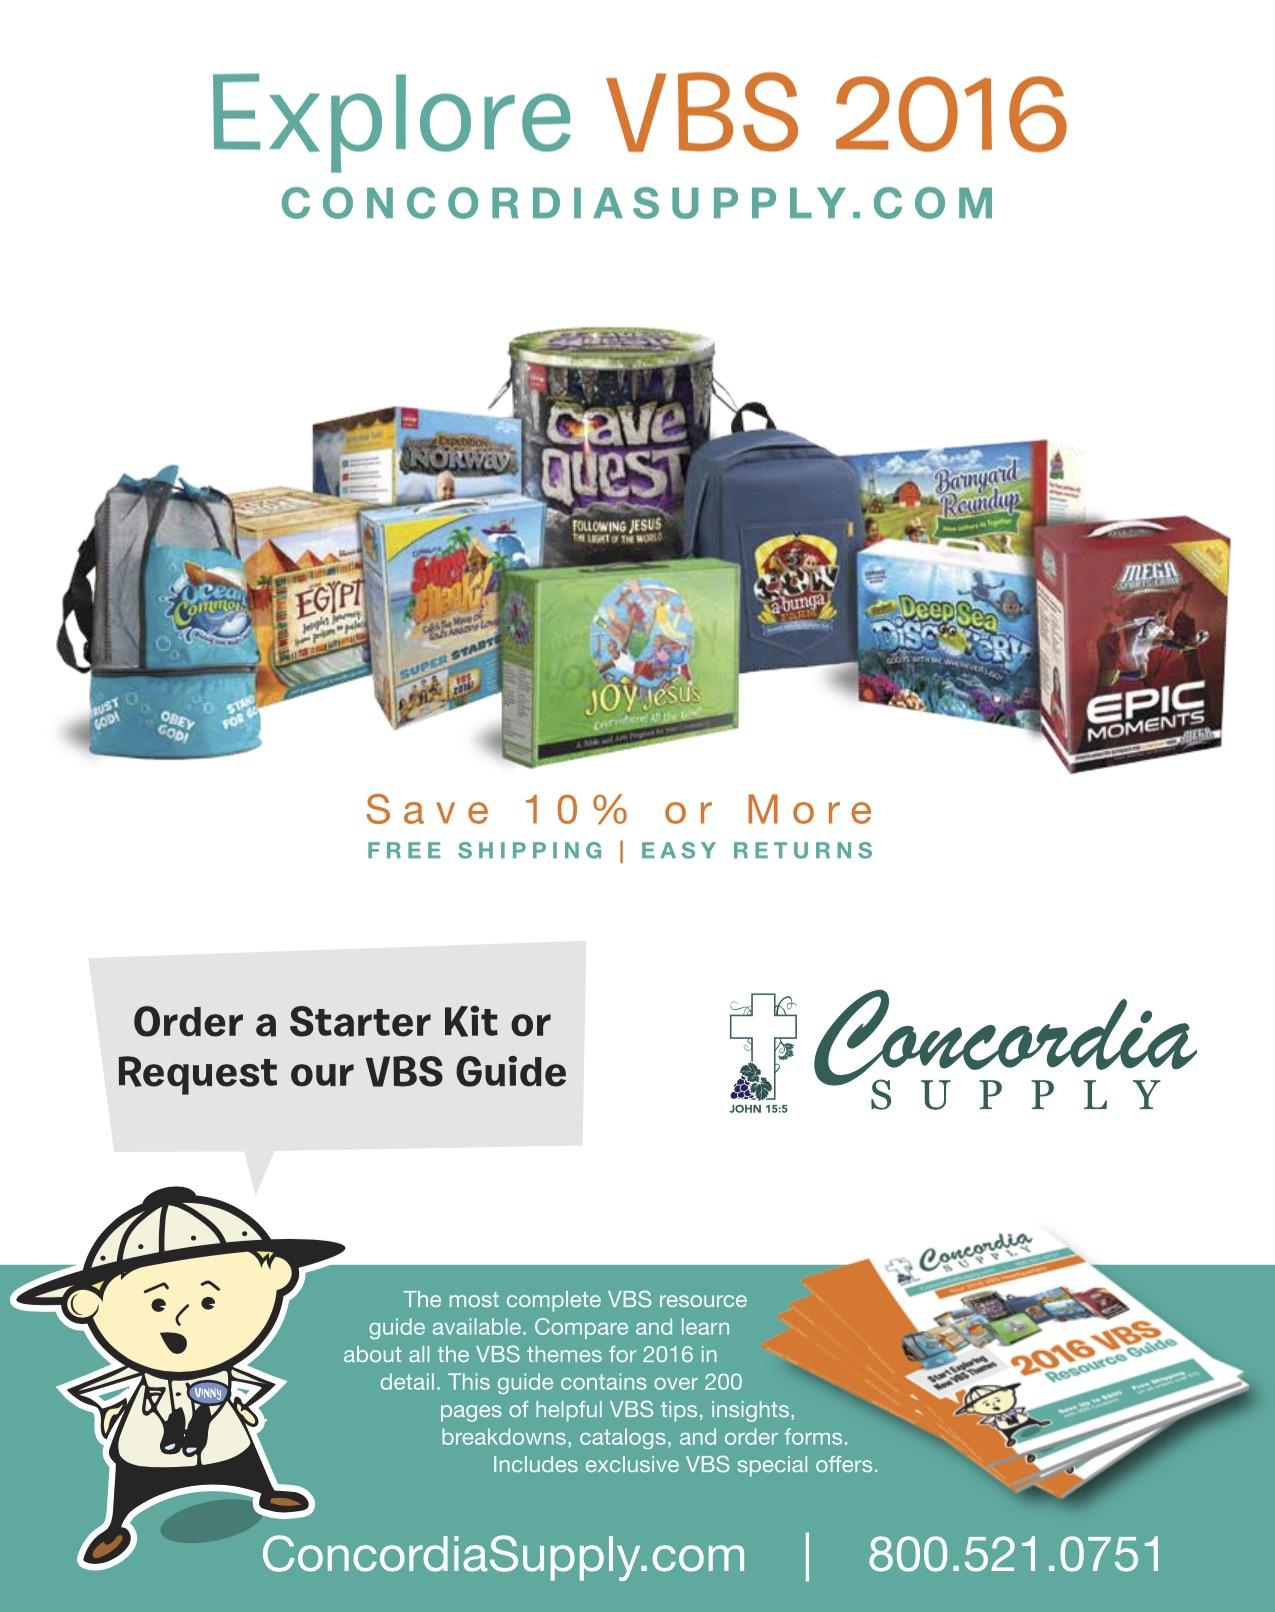 concordiasupply-cmmag-jan-feb-fullpage-FINAL copy.jpg